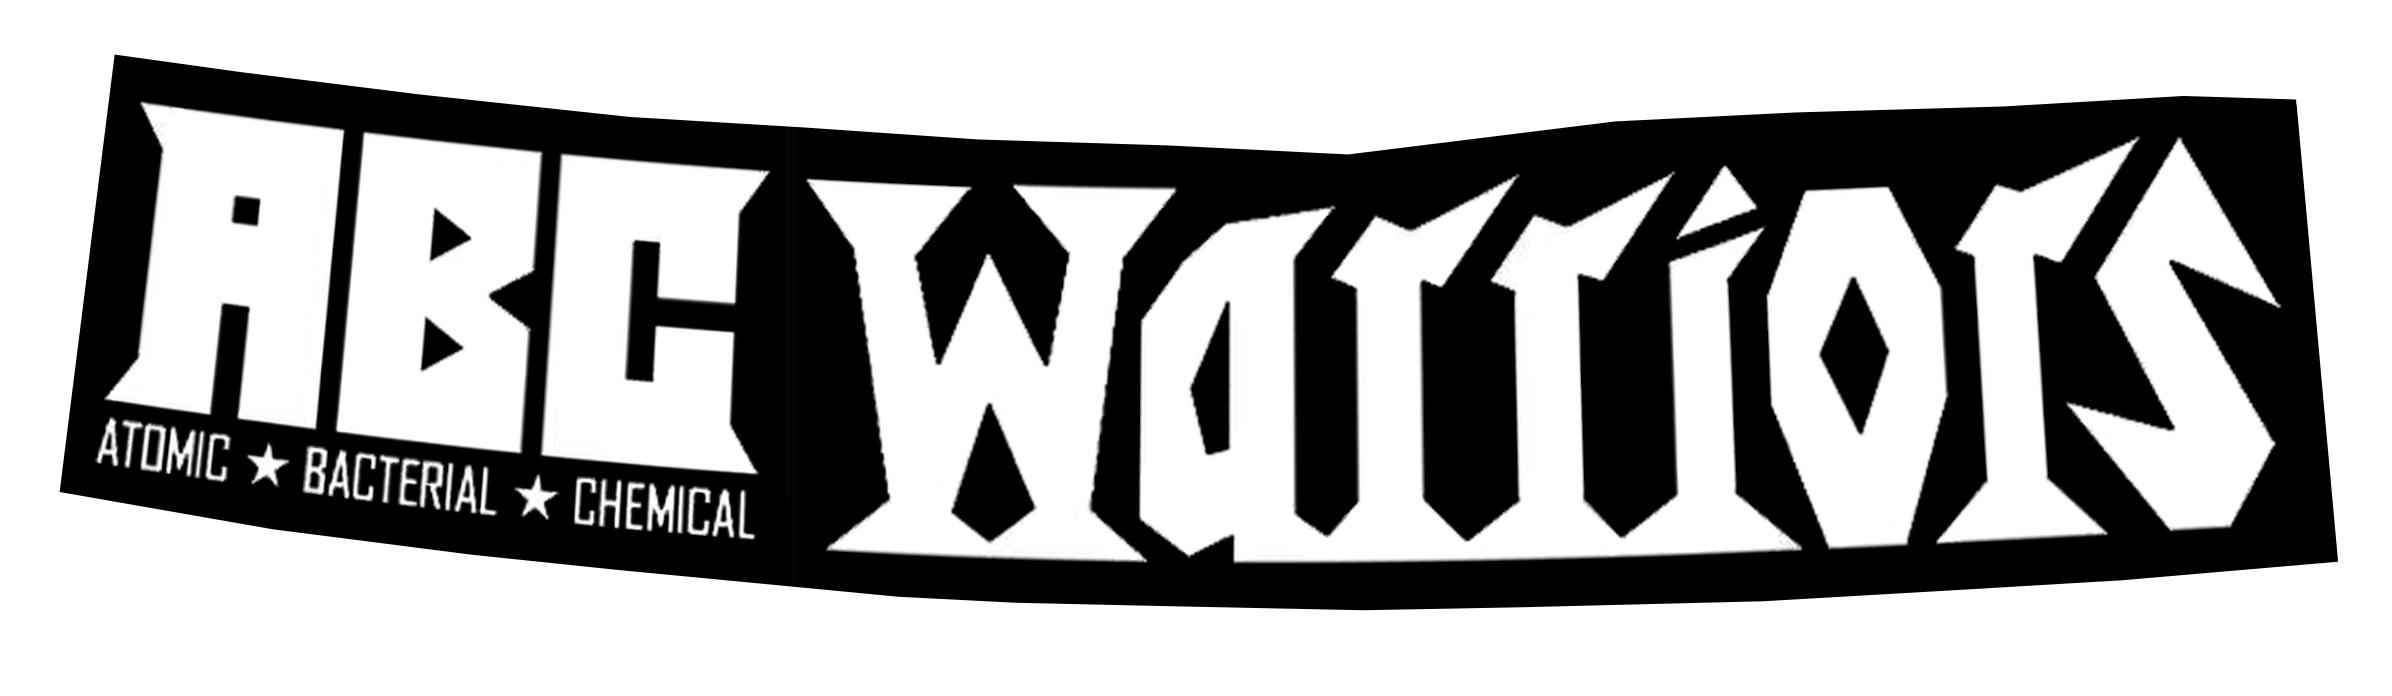 ABC Warrior 23010